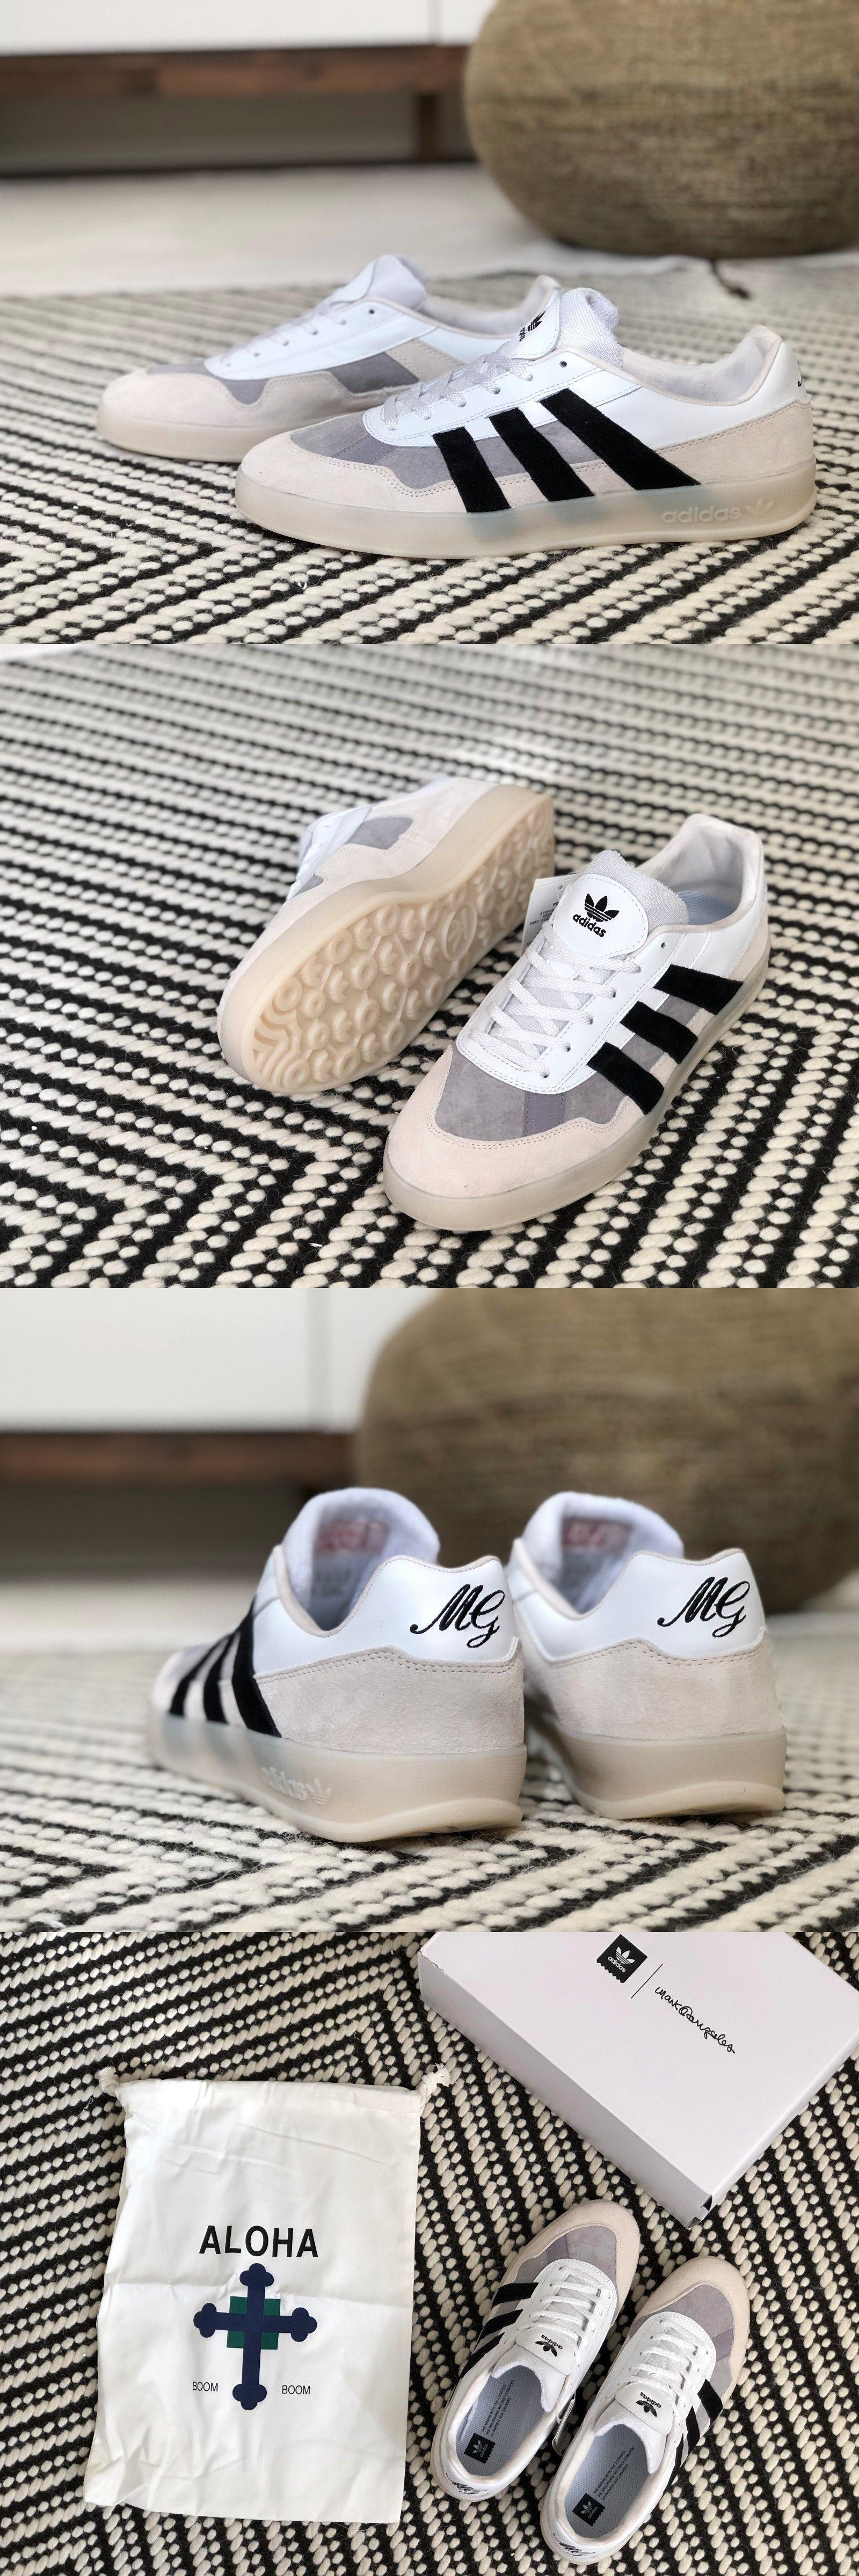 newest 64aa8 e0995 Footwear 50883  Adidas Skateboarding Aloha Super Mark Gonzales Us Mens 8.5,  10.5, 11, 11.5 New -  BUY IT NOW ONLY   189.99 on  eBay  footwear  adidas  ...